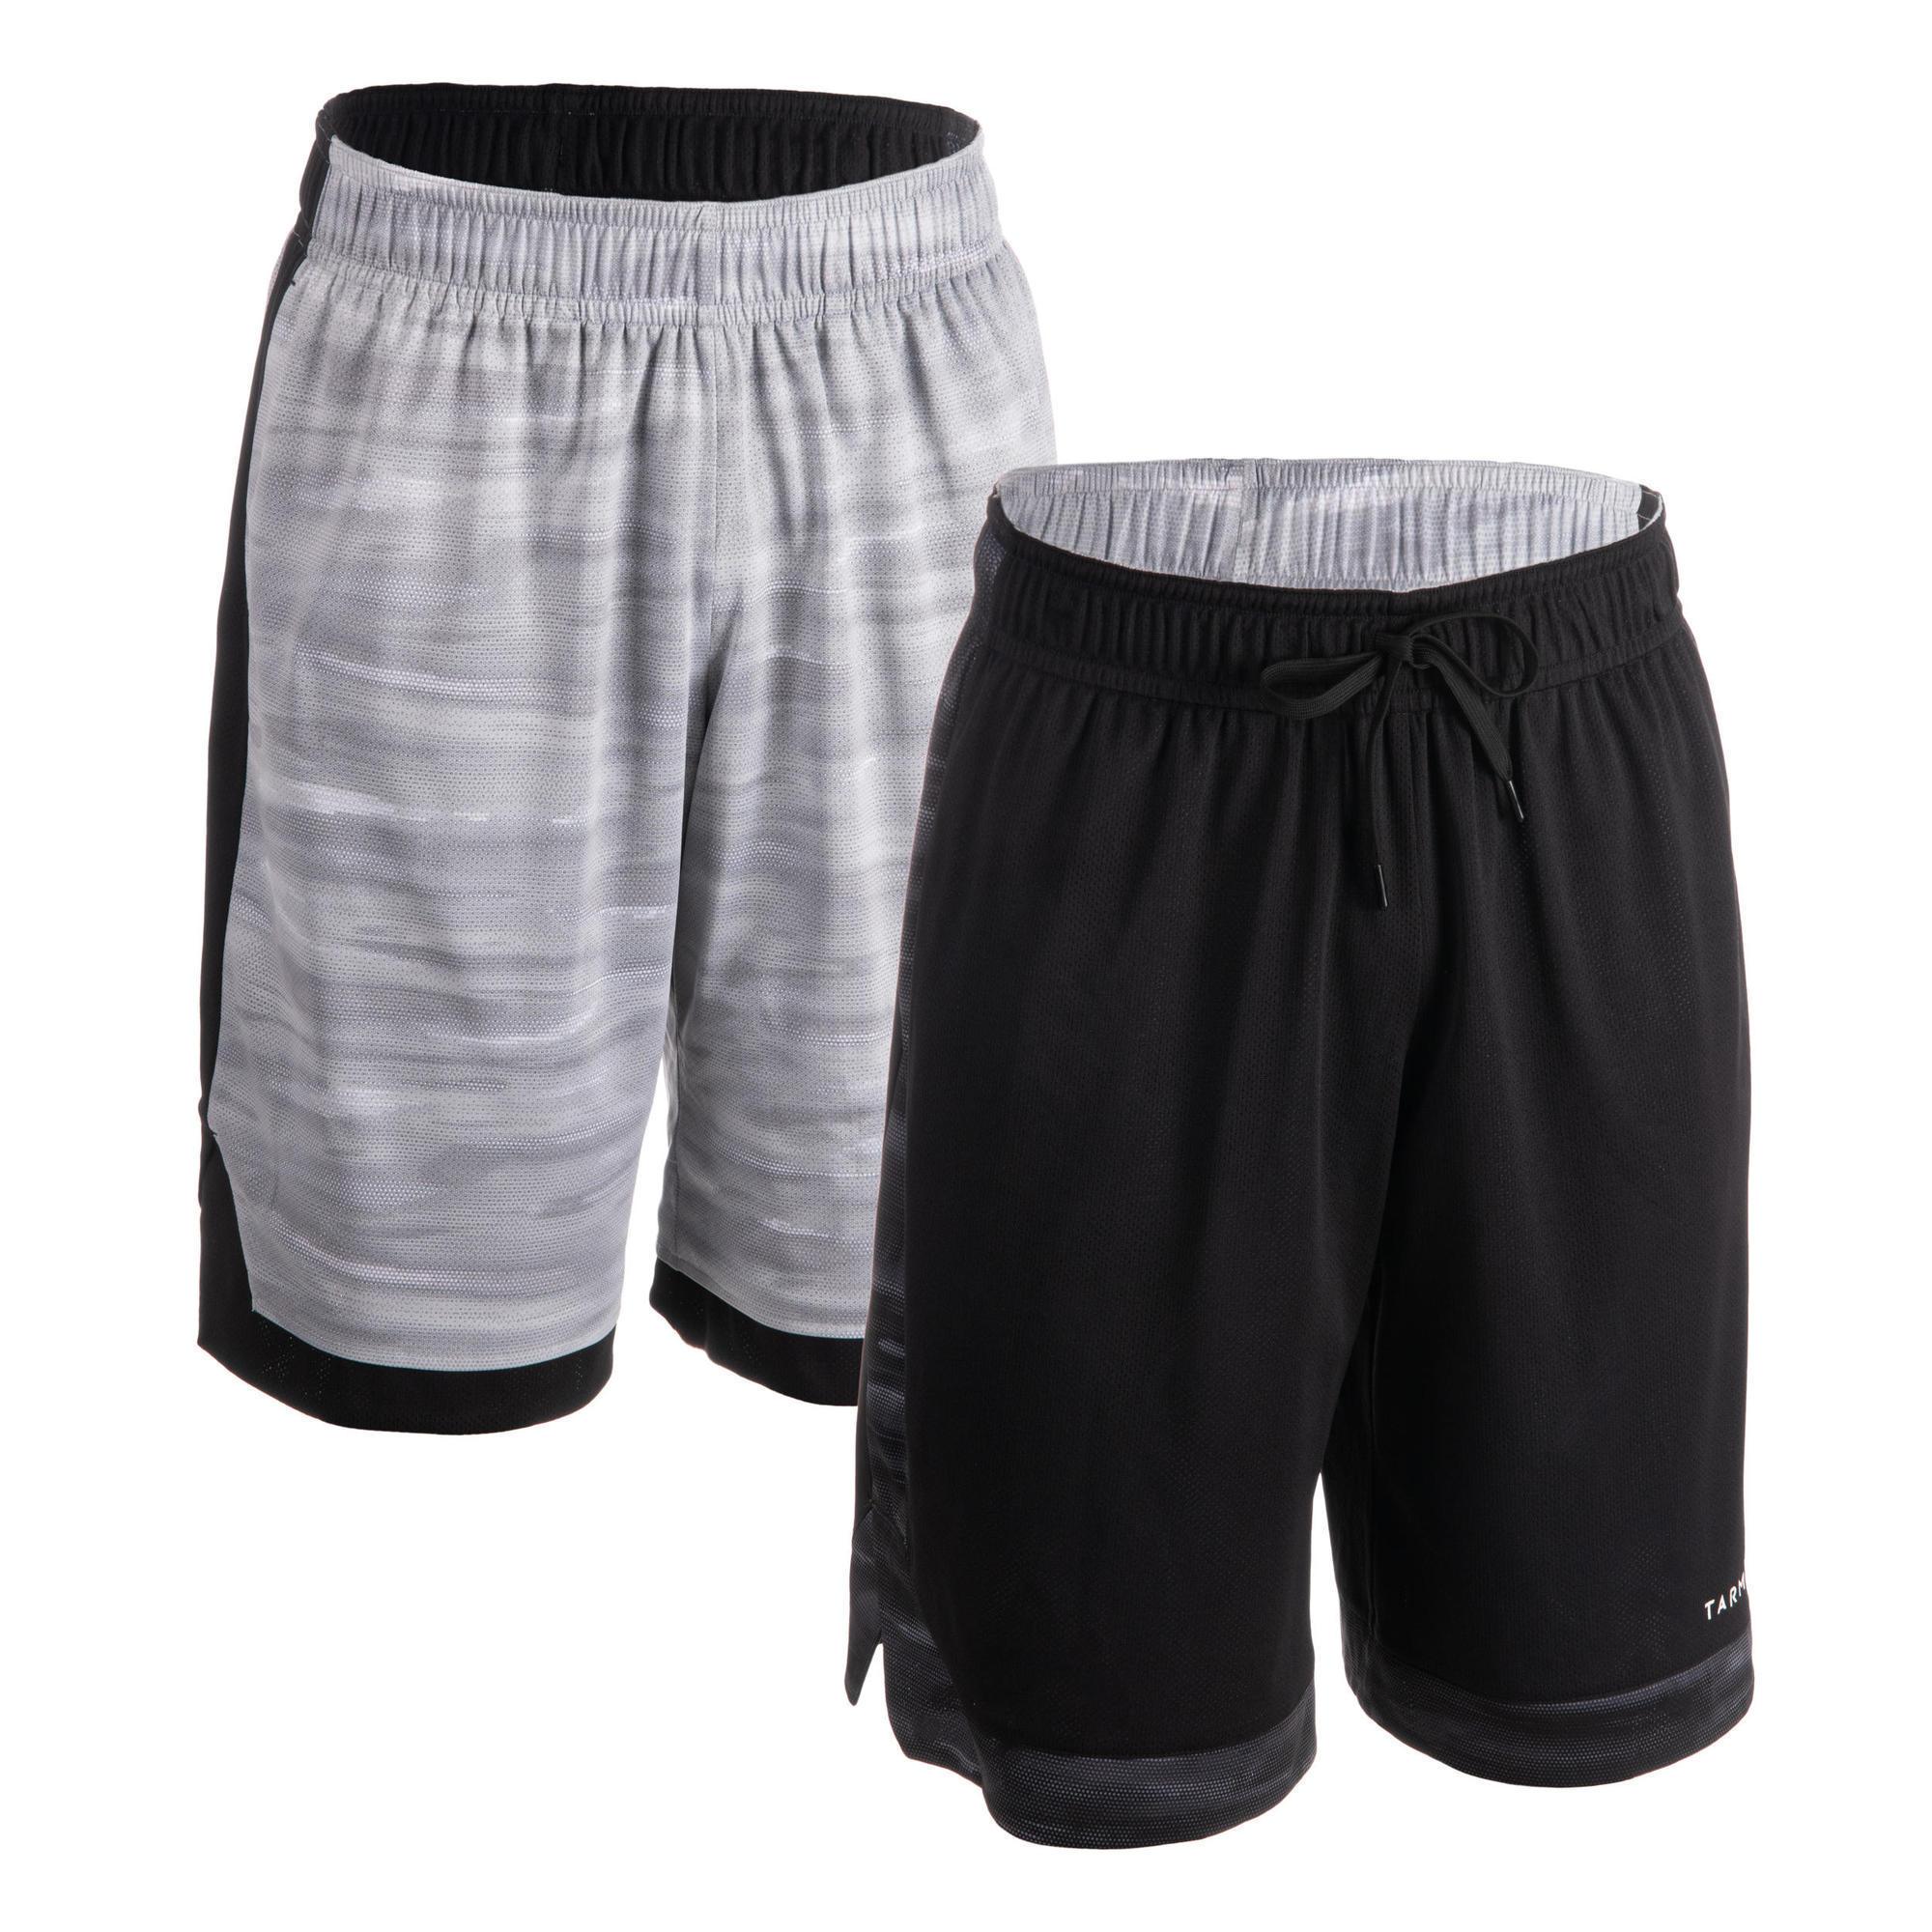 Basketballshorts wendbar SH500R Herren   Sportbekleidung > Sporthosen > Basketballshorts   Tarmak